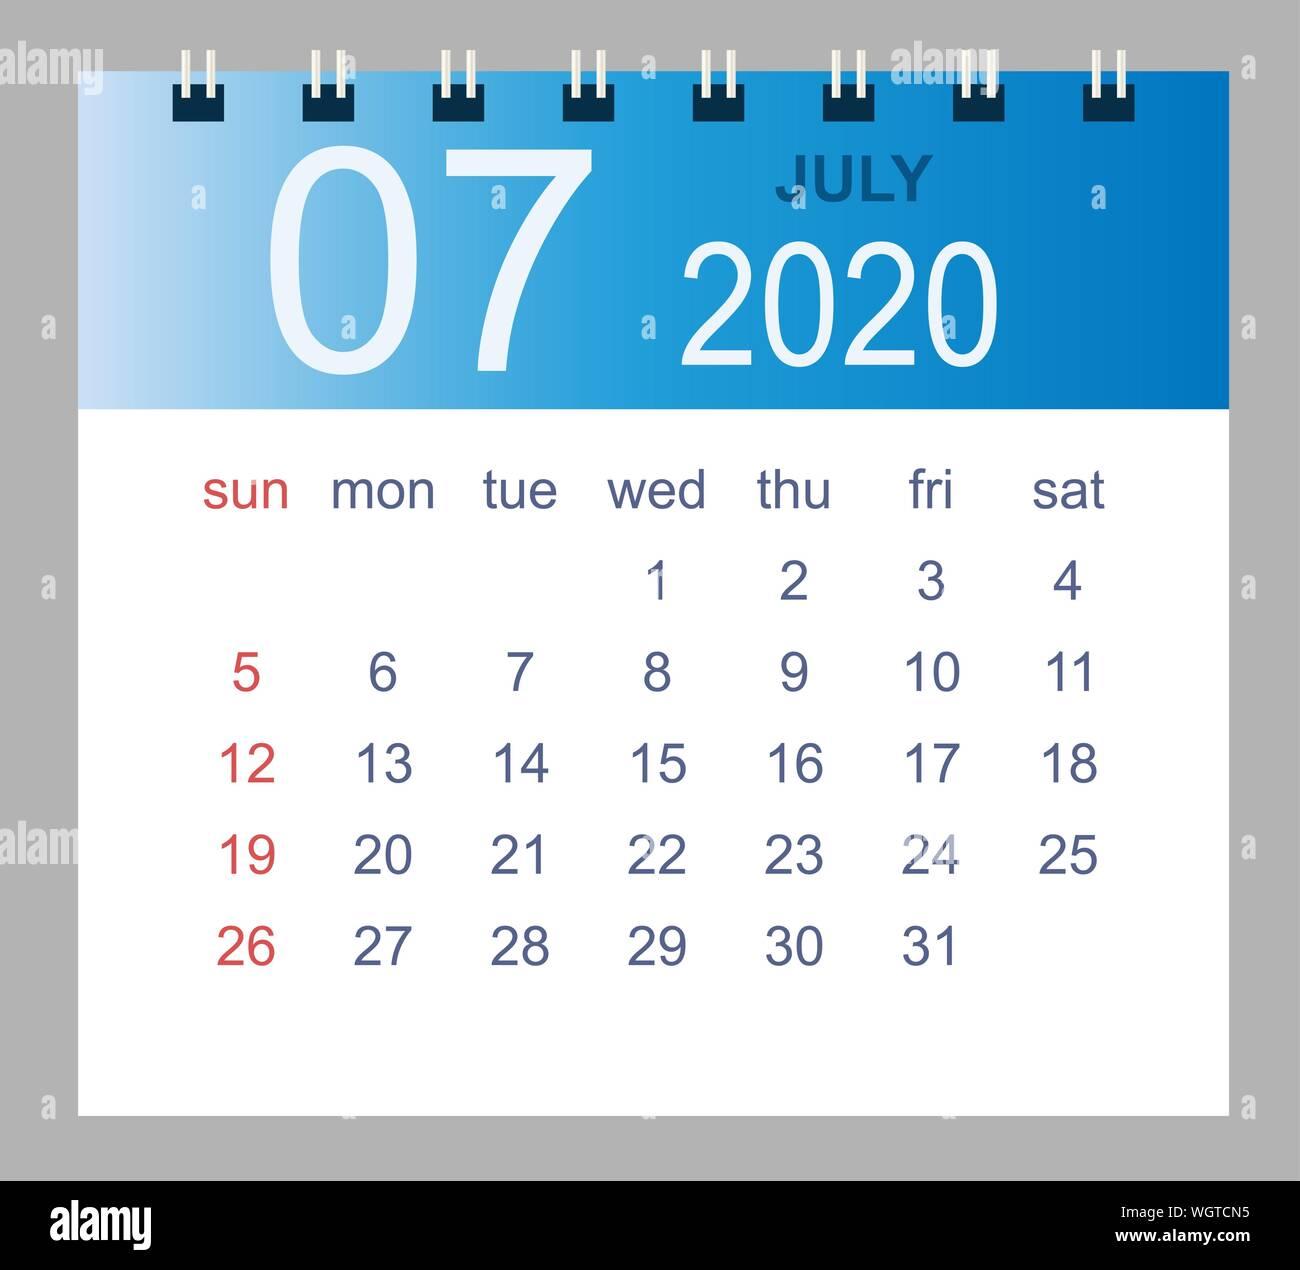 Calendario Luglio 2020 Da Stampare.Simple 2020 Year Calendar Week Immagini Simple 2020 Year